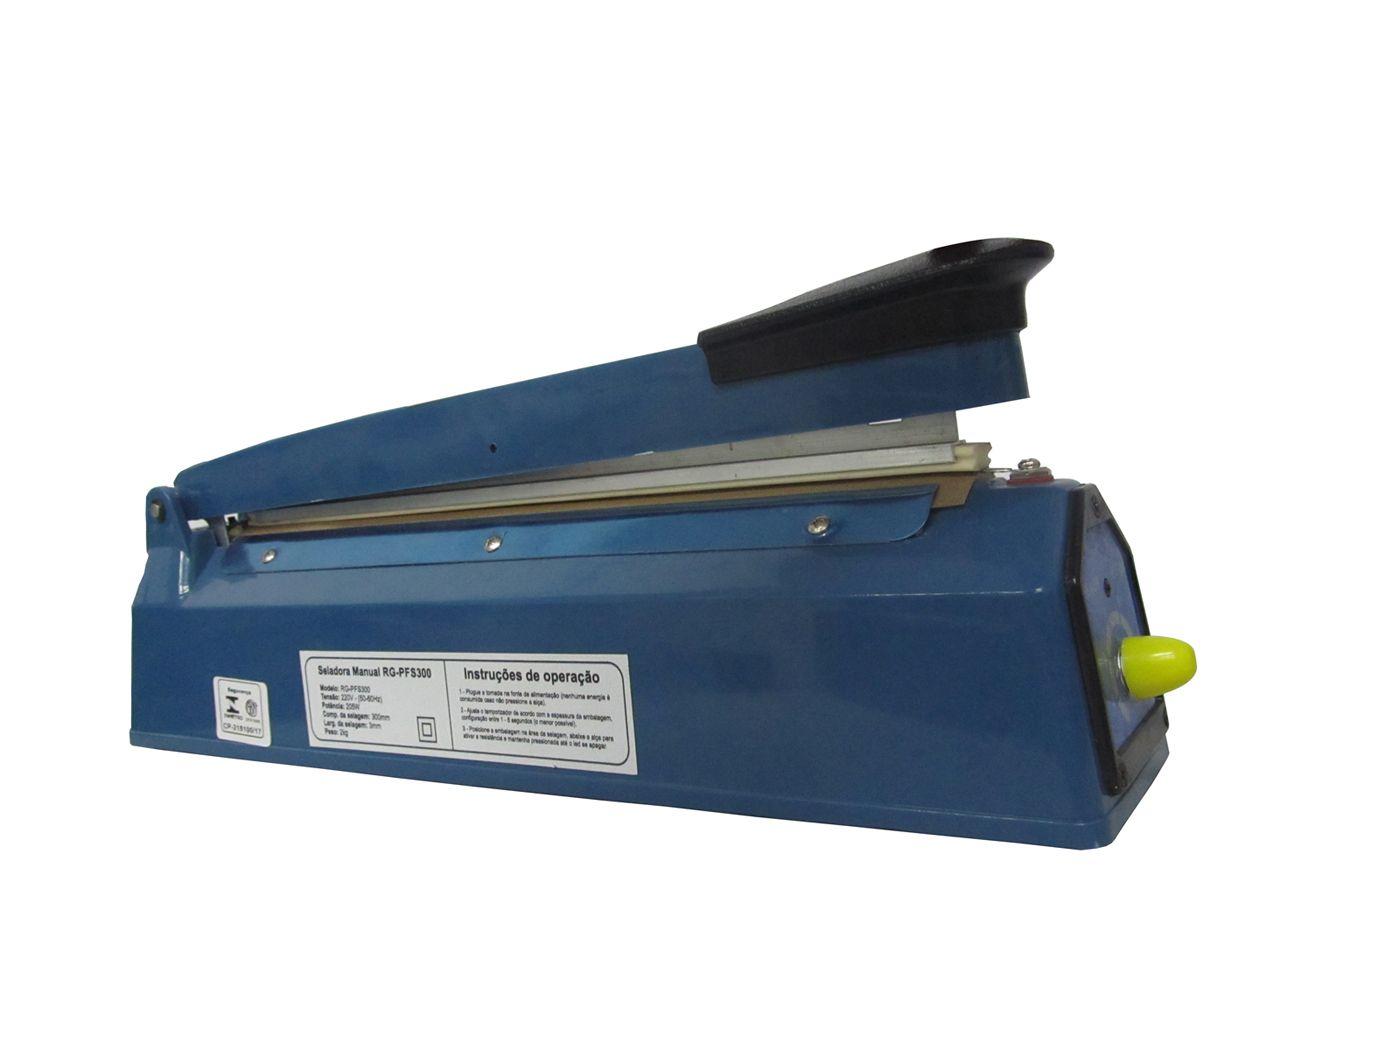 Seladora Manual RG-PFS300 - 220V